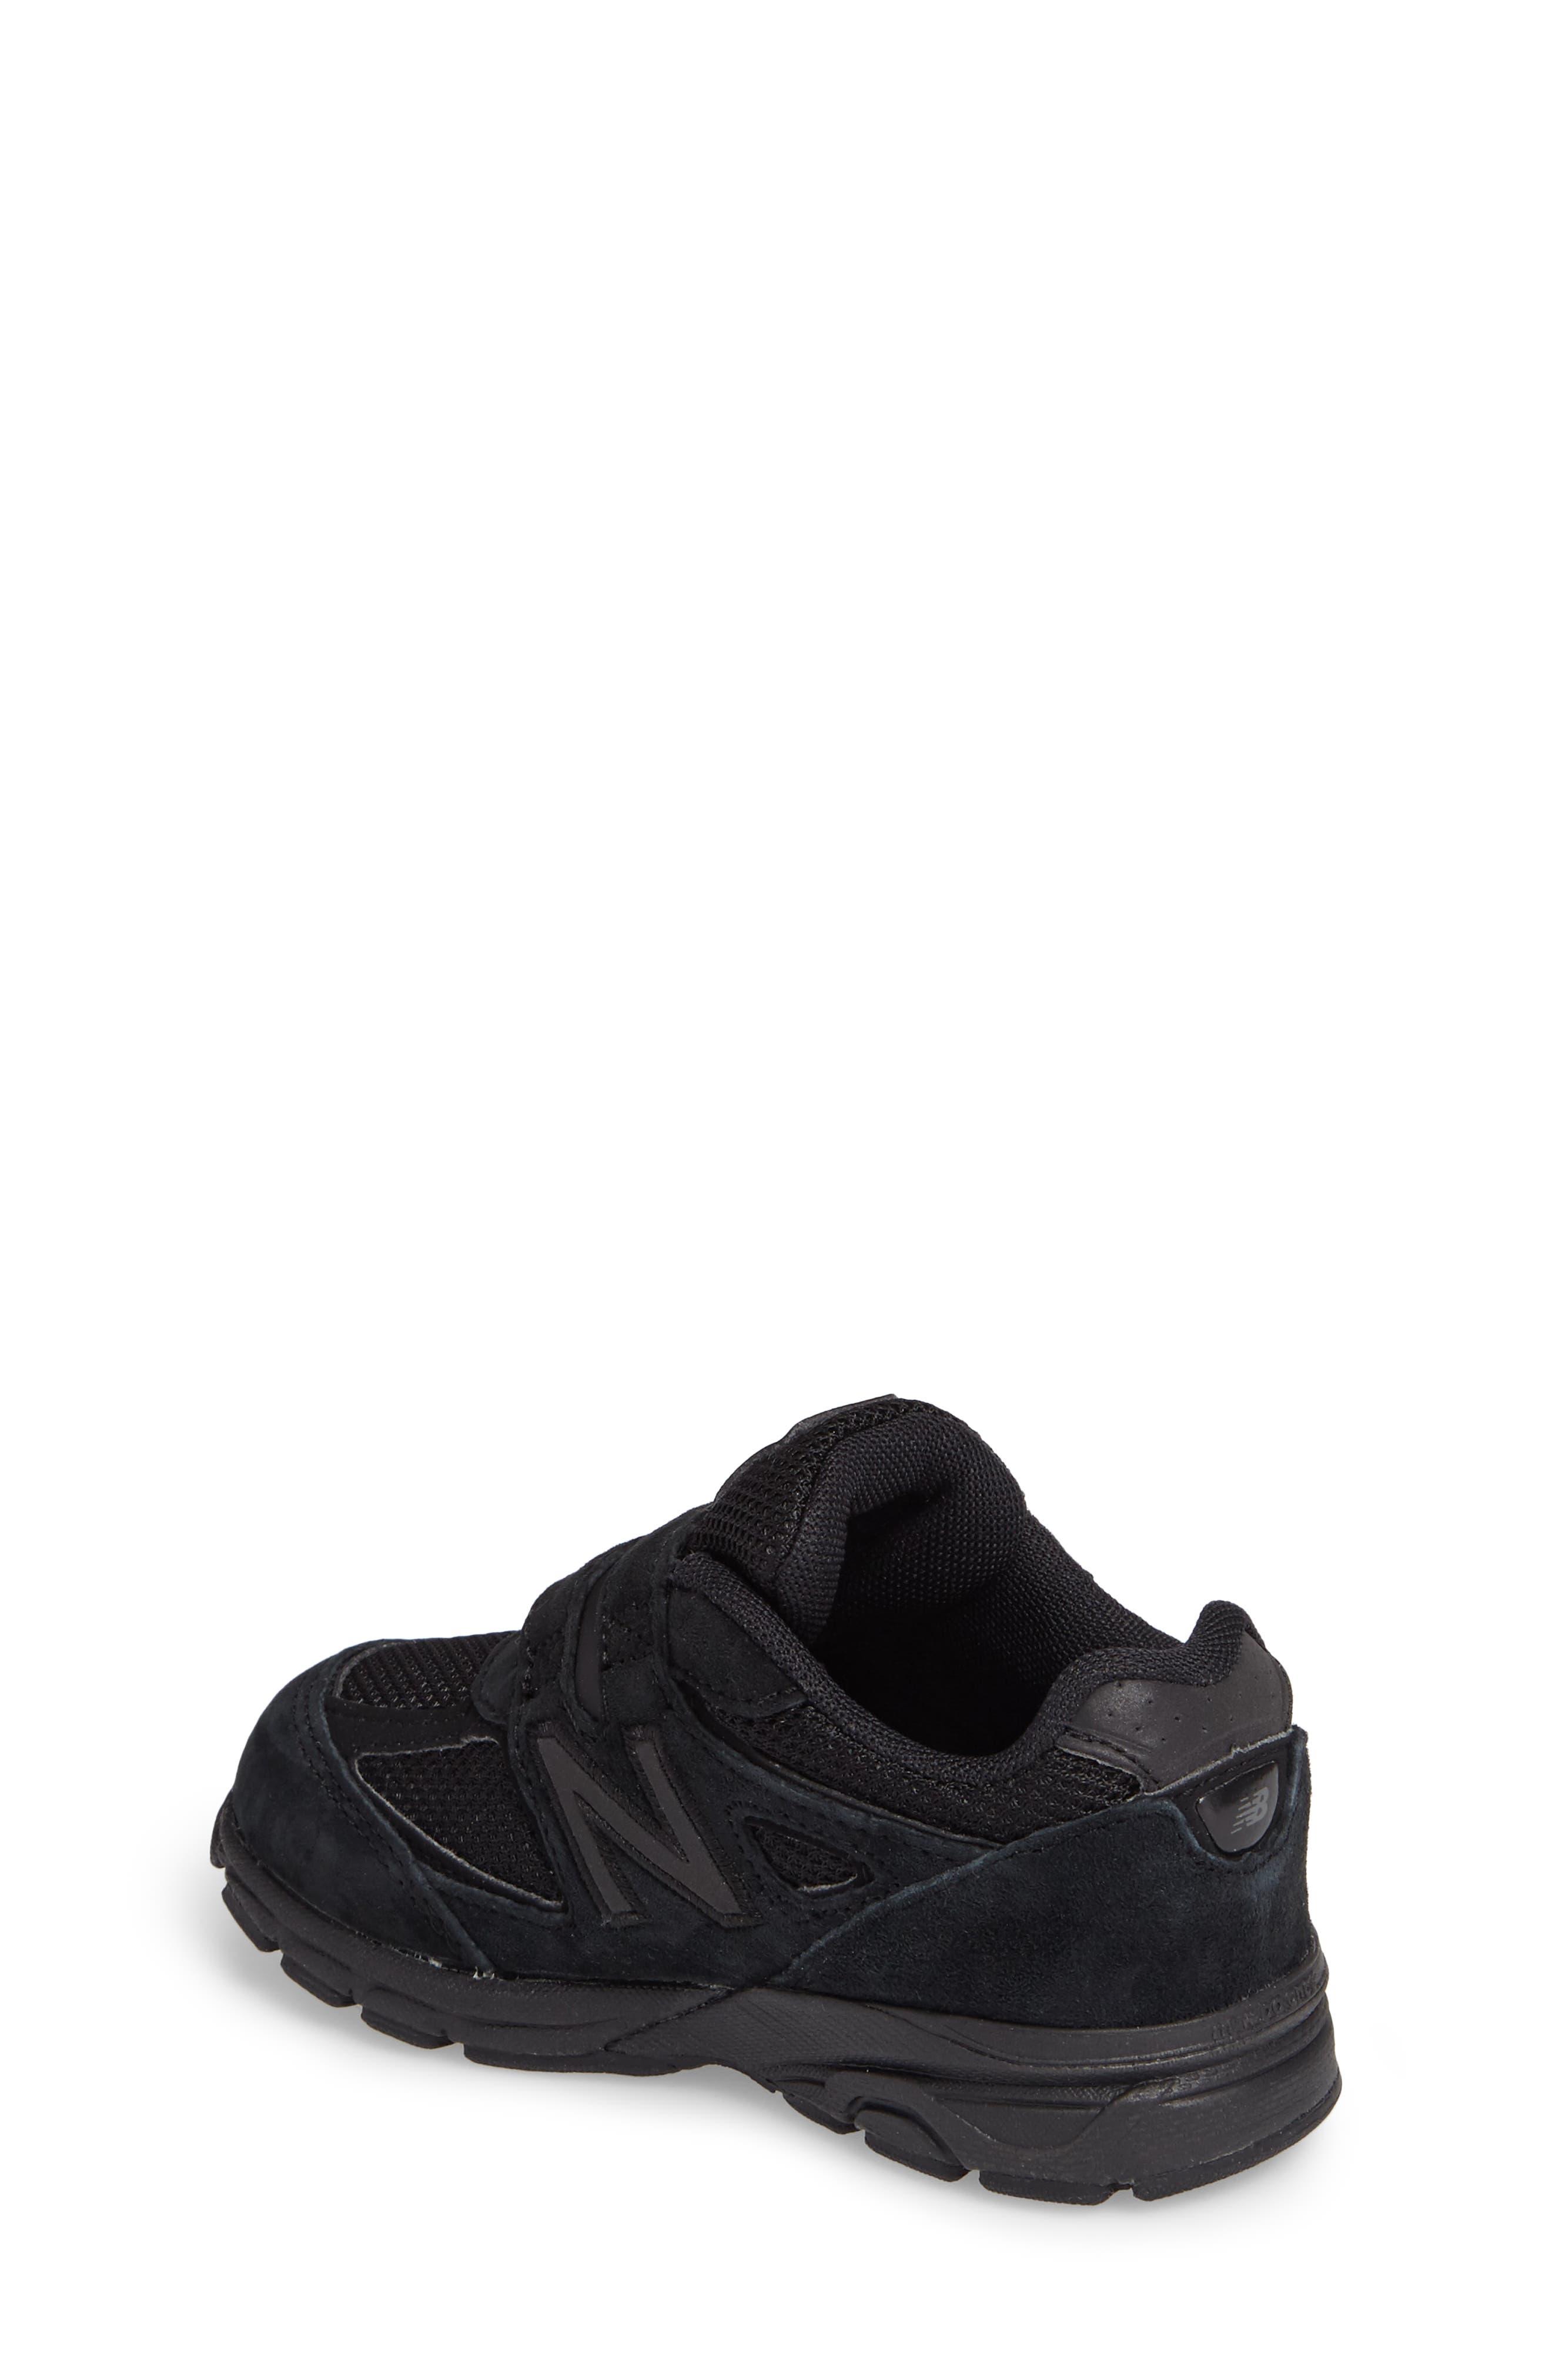 '990v4' Sneaker,                             Alternate thumbnail 2, color,                             Black/ Black